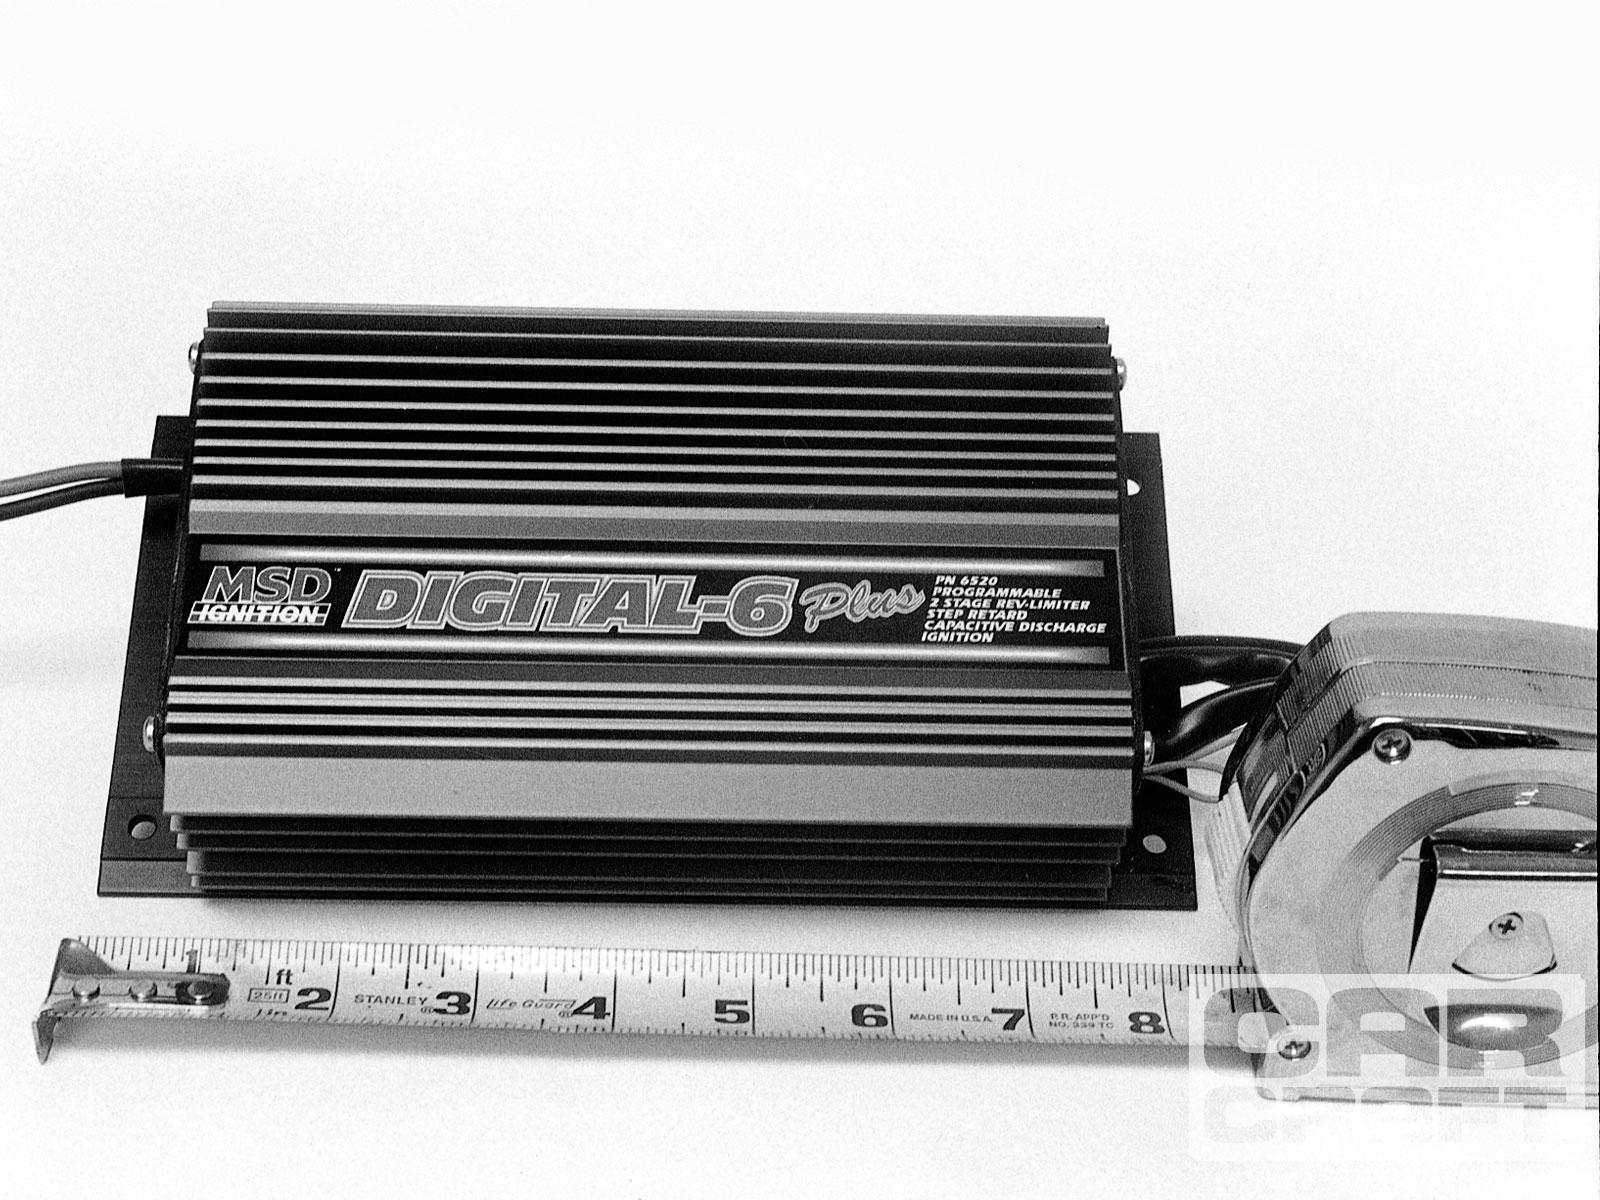 Msd Ignition Digital-6 Plus Install - Hot Rod Network - Msd Digital 6 Plus Wiring Diagram